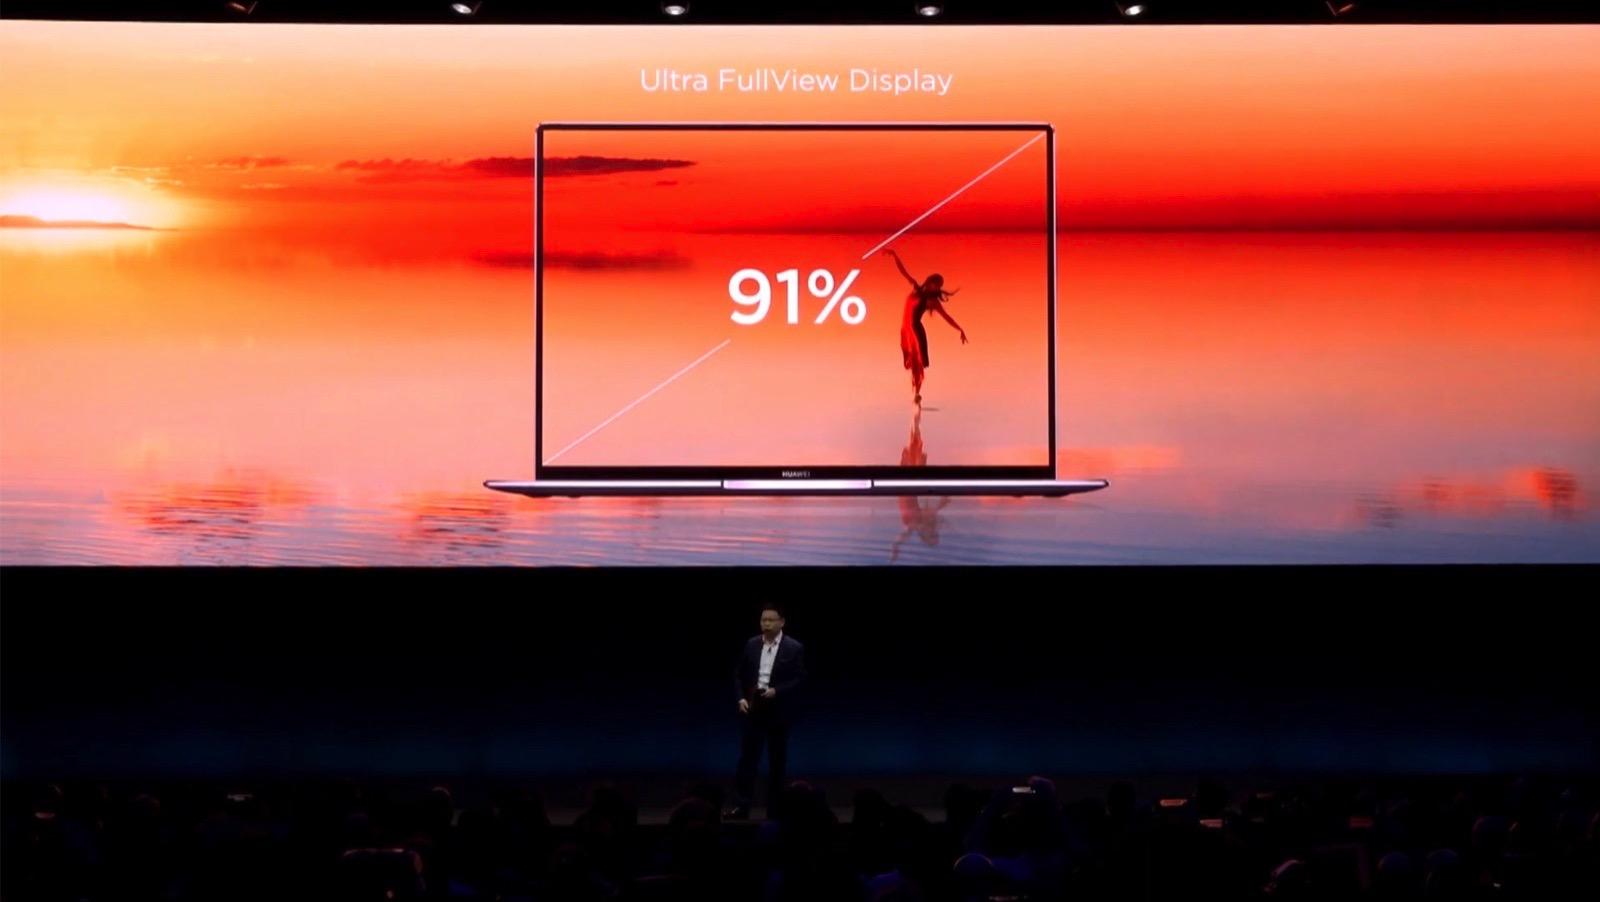 Huawei-MateBook-X-Pro-03.jpg